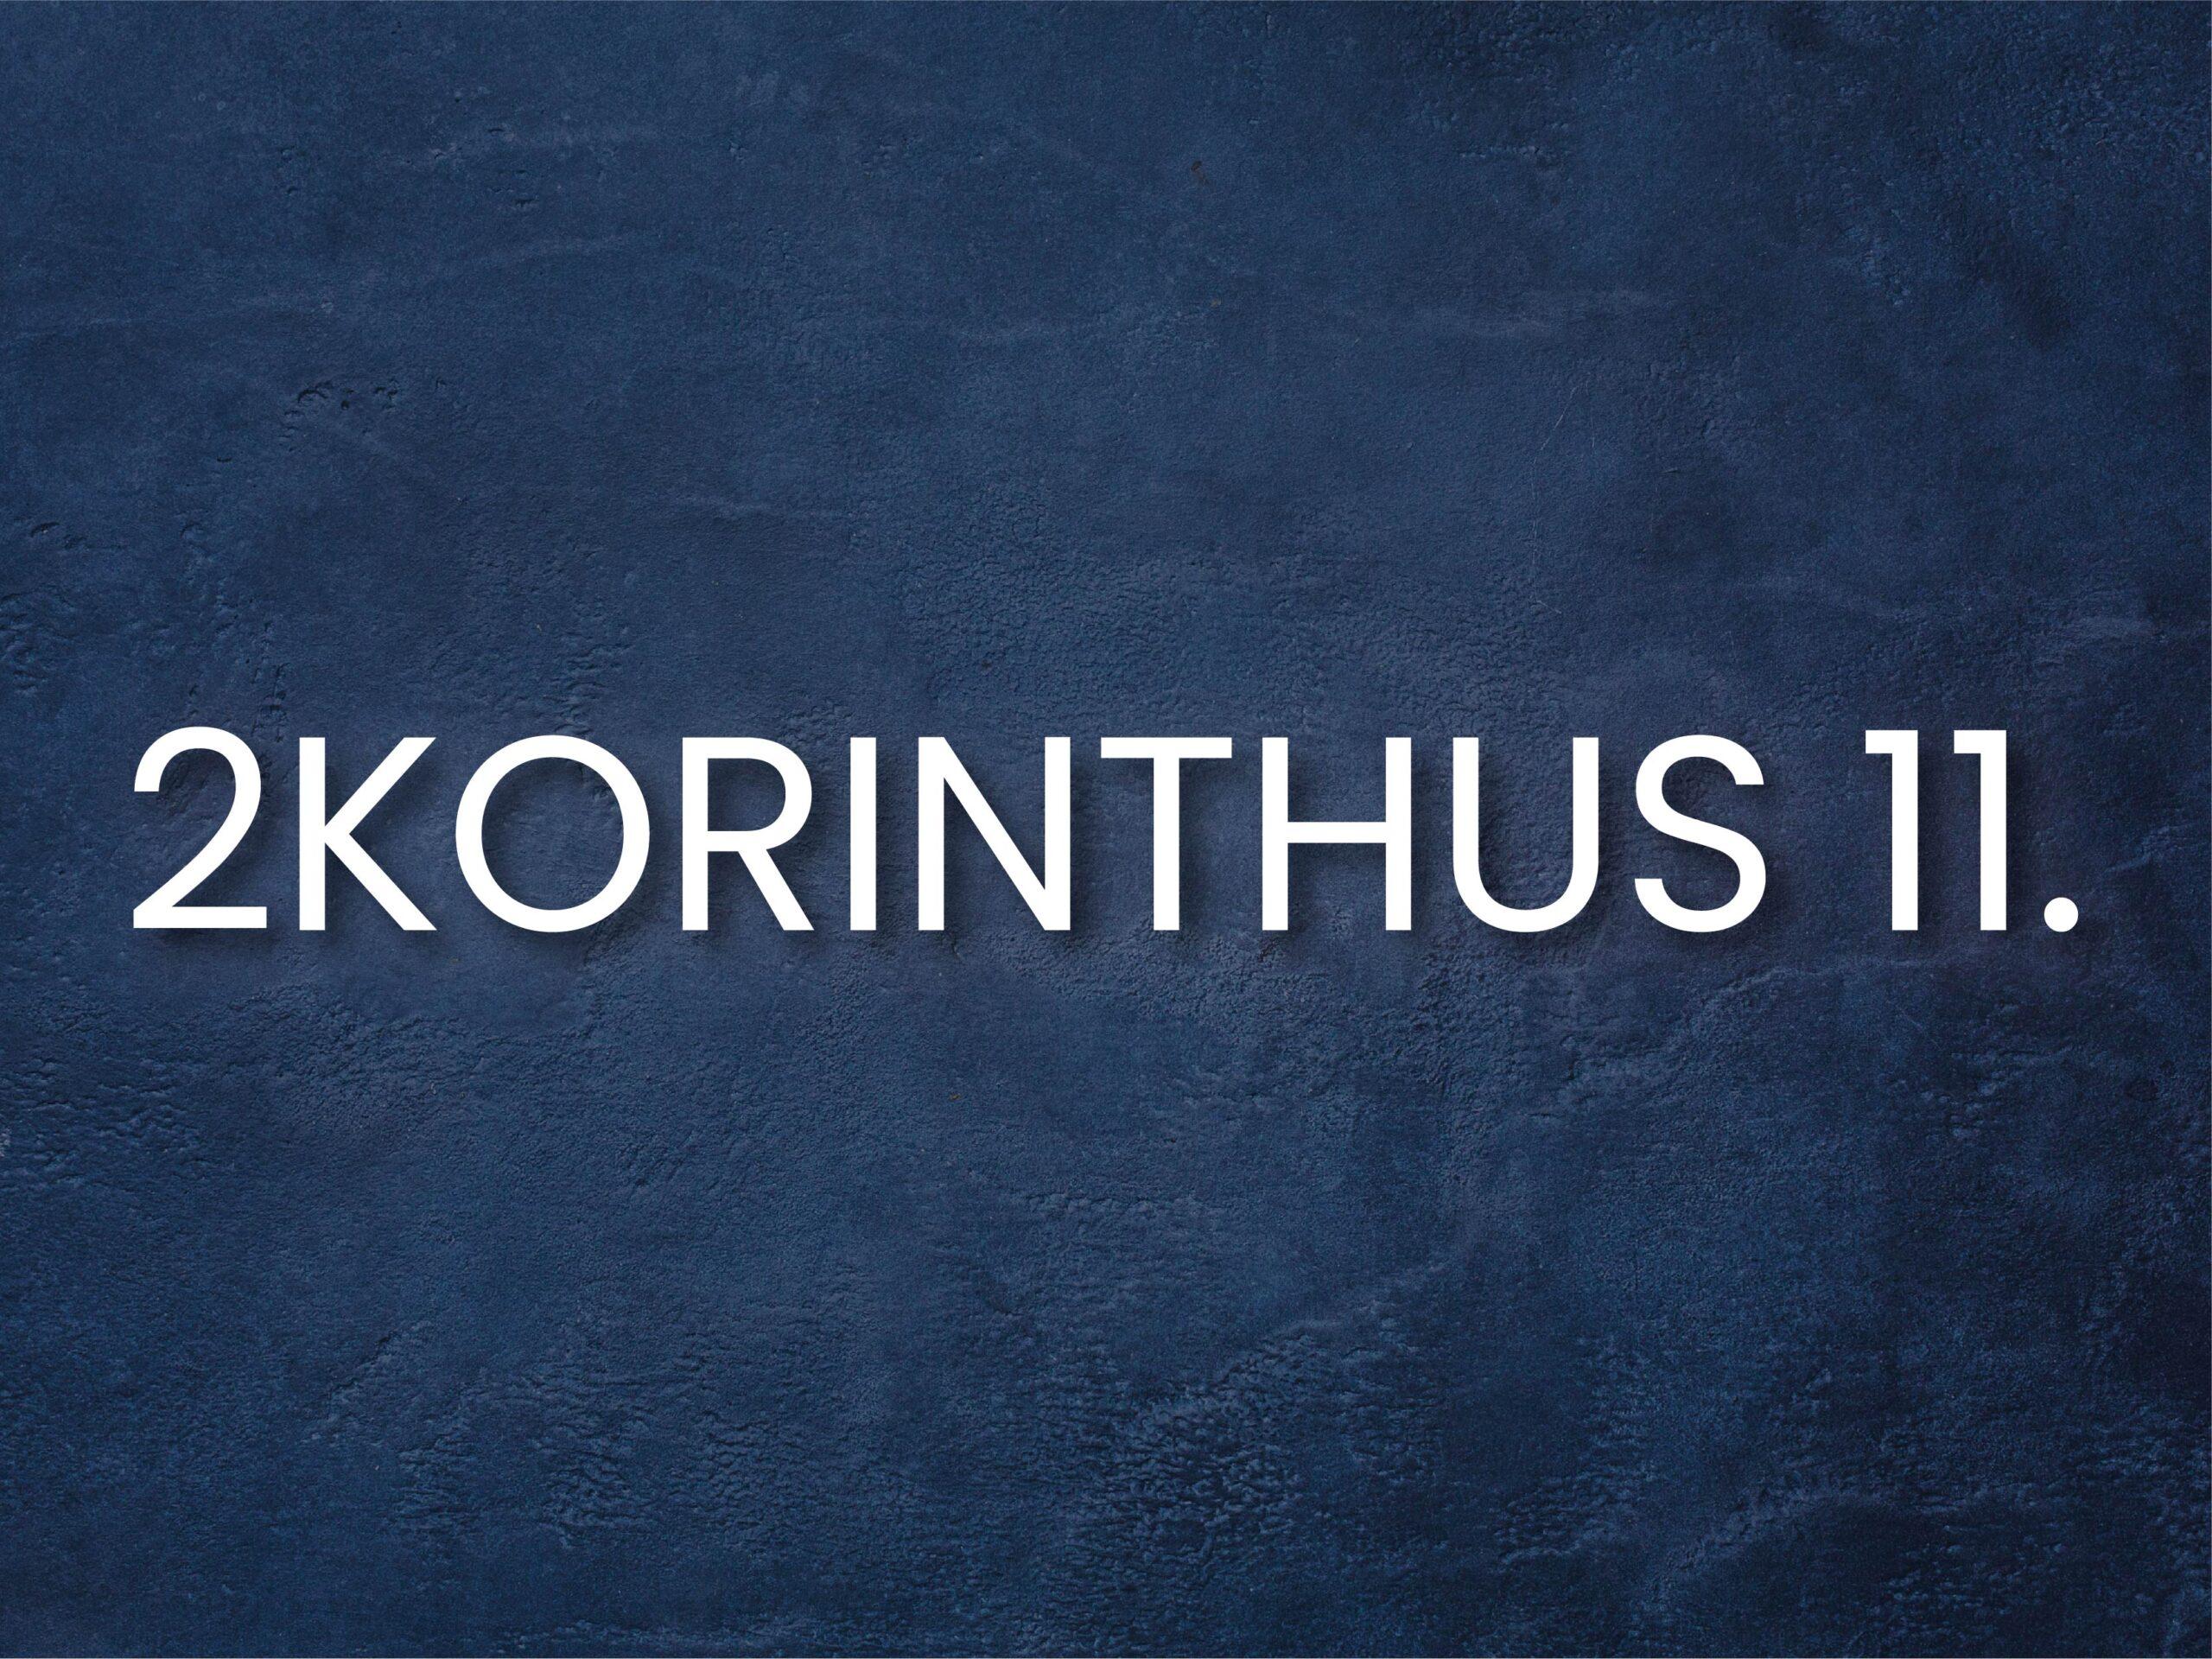 INFO_2korinthus_11